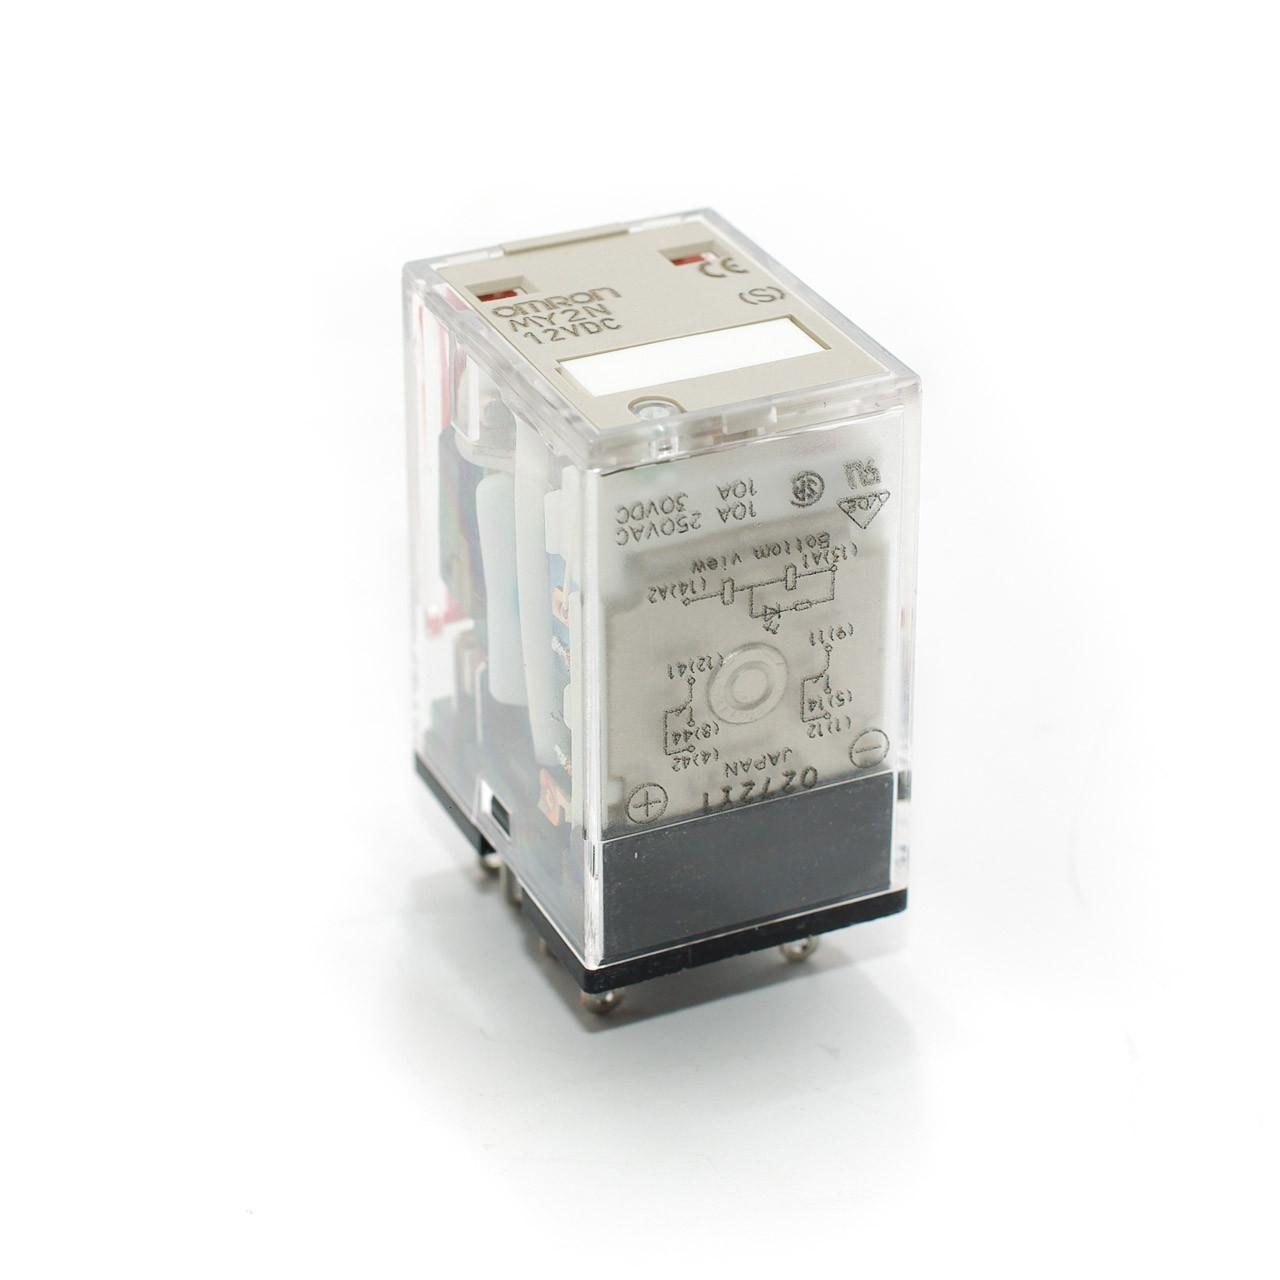 omron my2n 12vdc relay w led indicator [ 1280 x 1280 Pixel ]